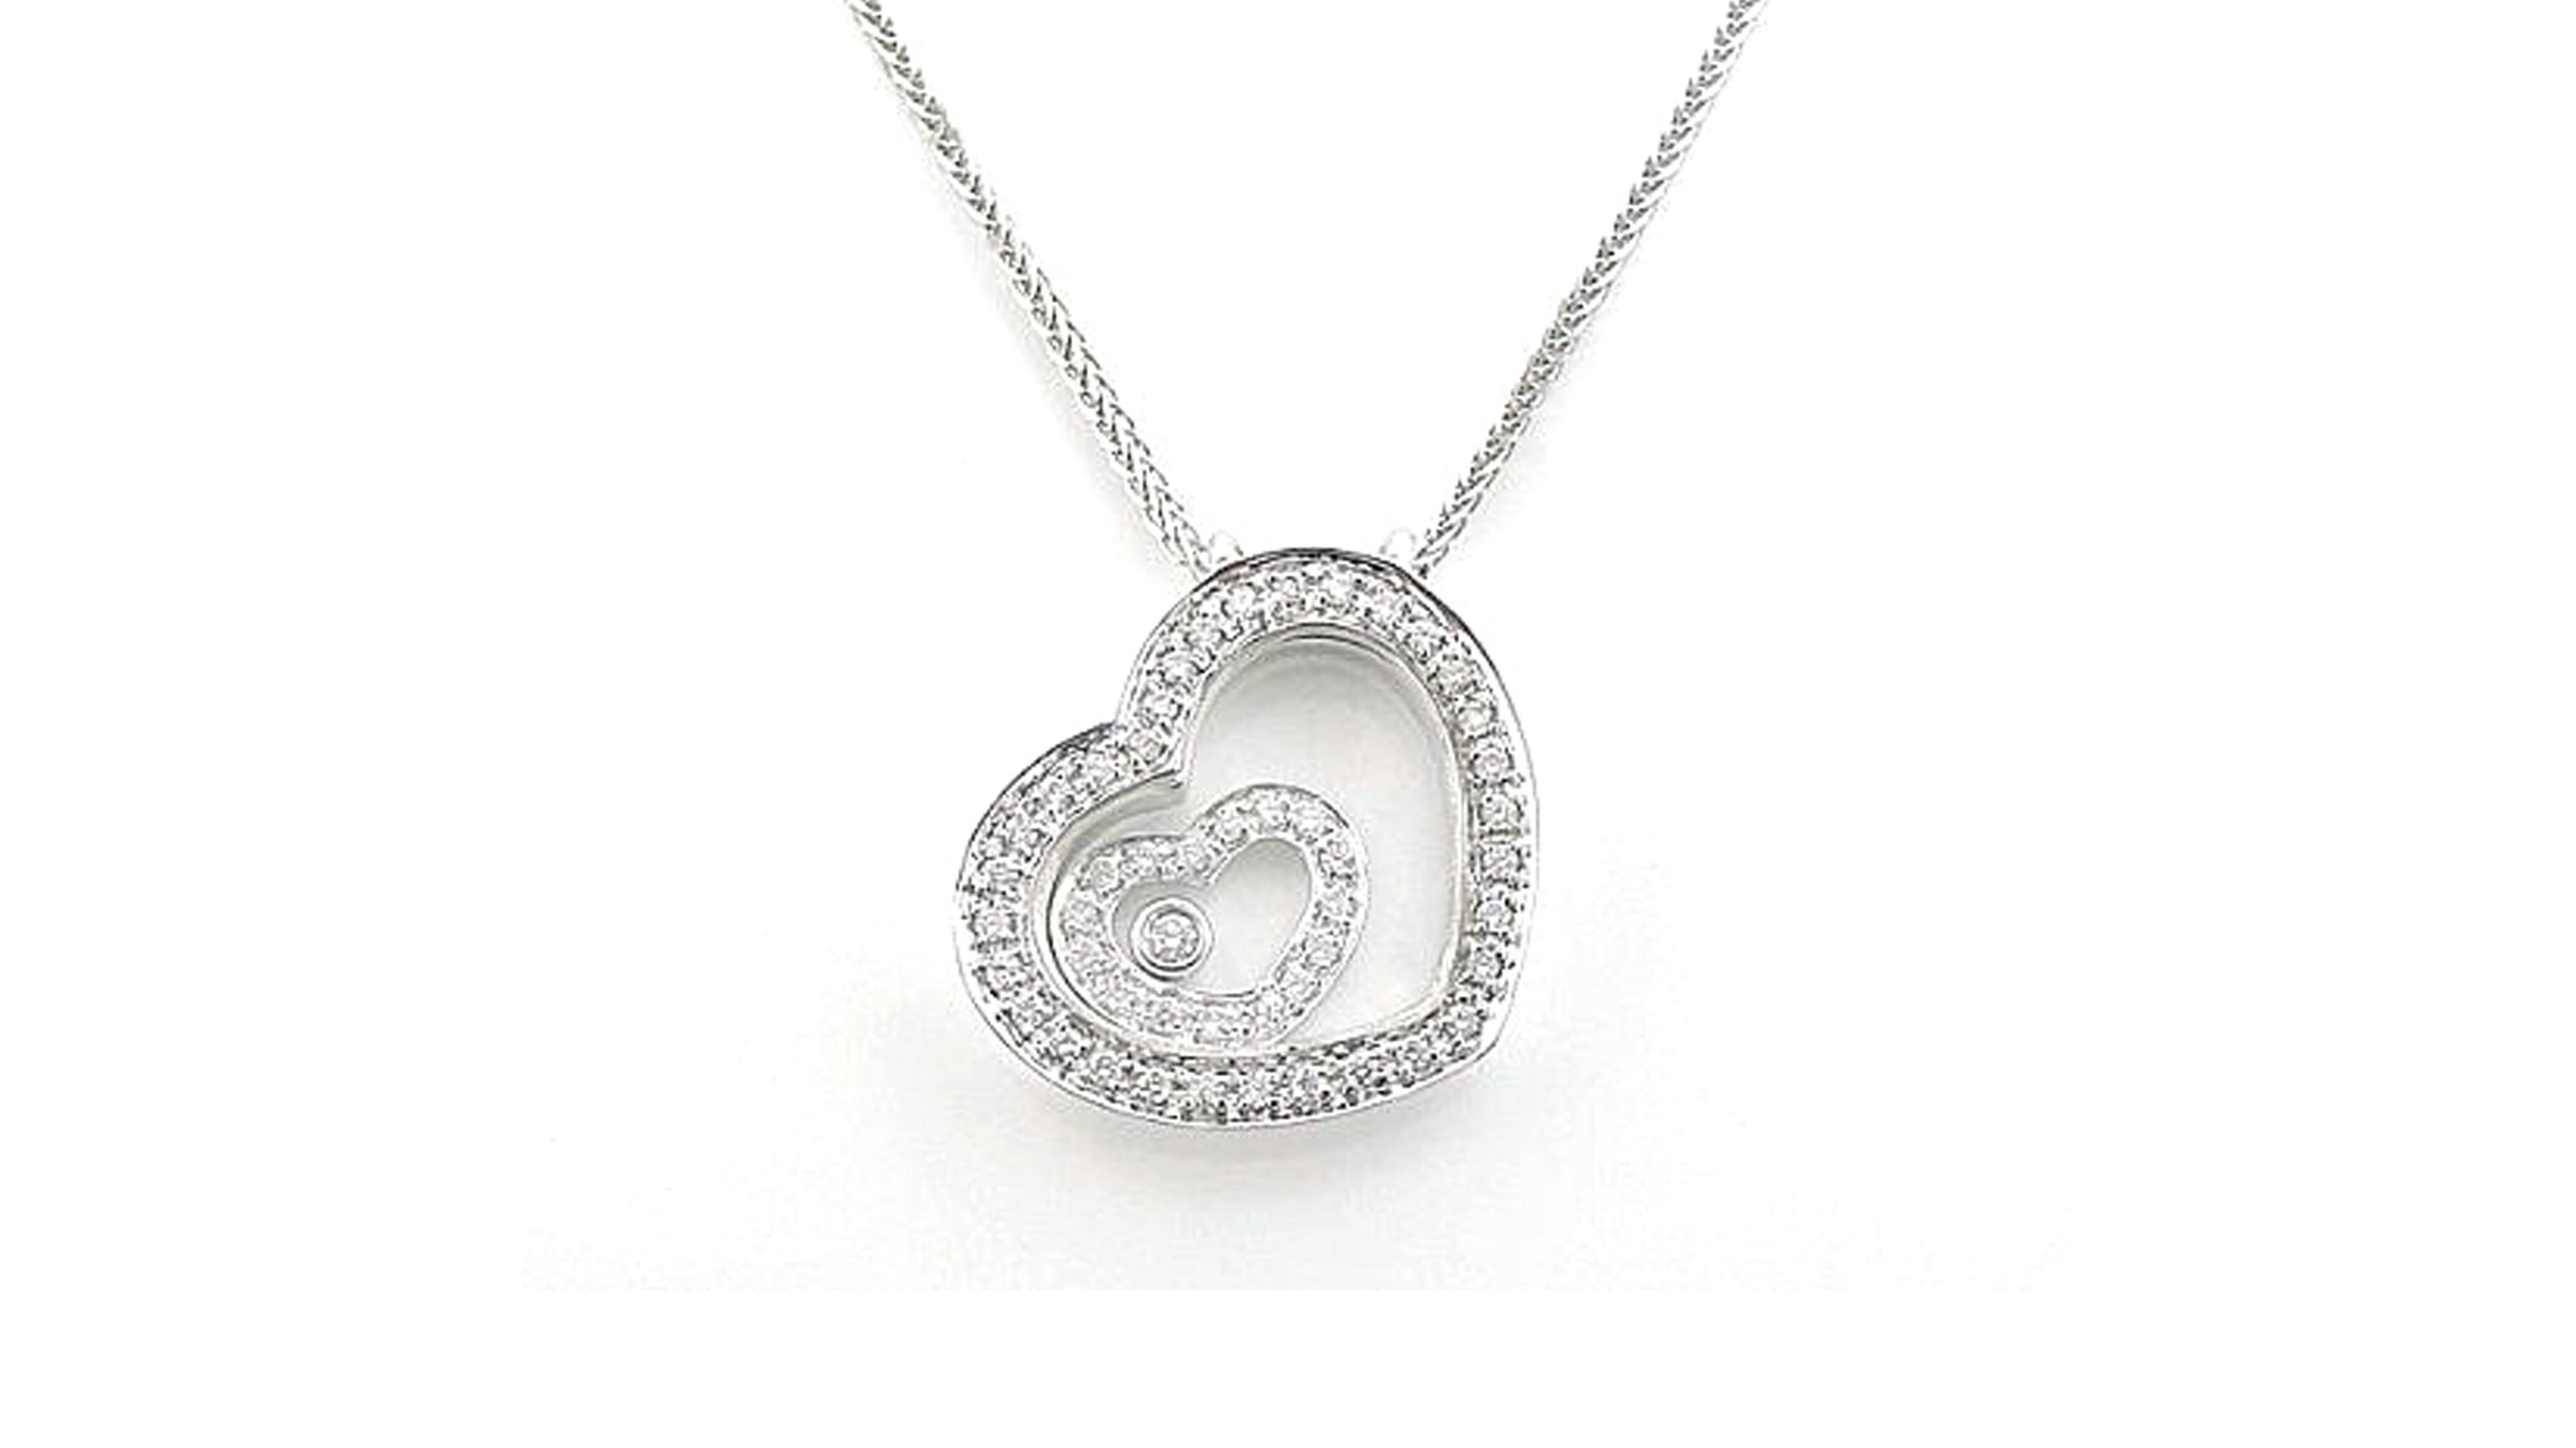 Enchanted diamond heart within a diamond heart diamond pendant encased in cystal